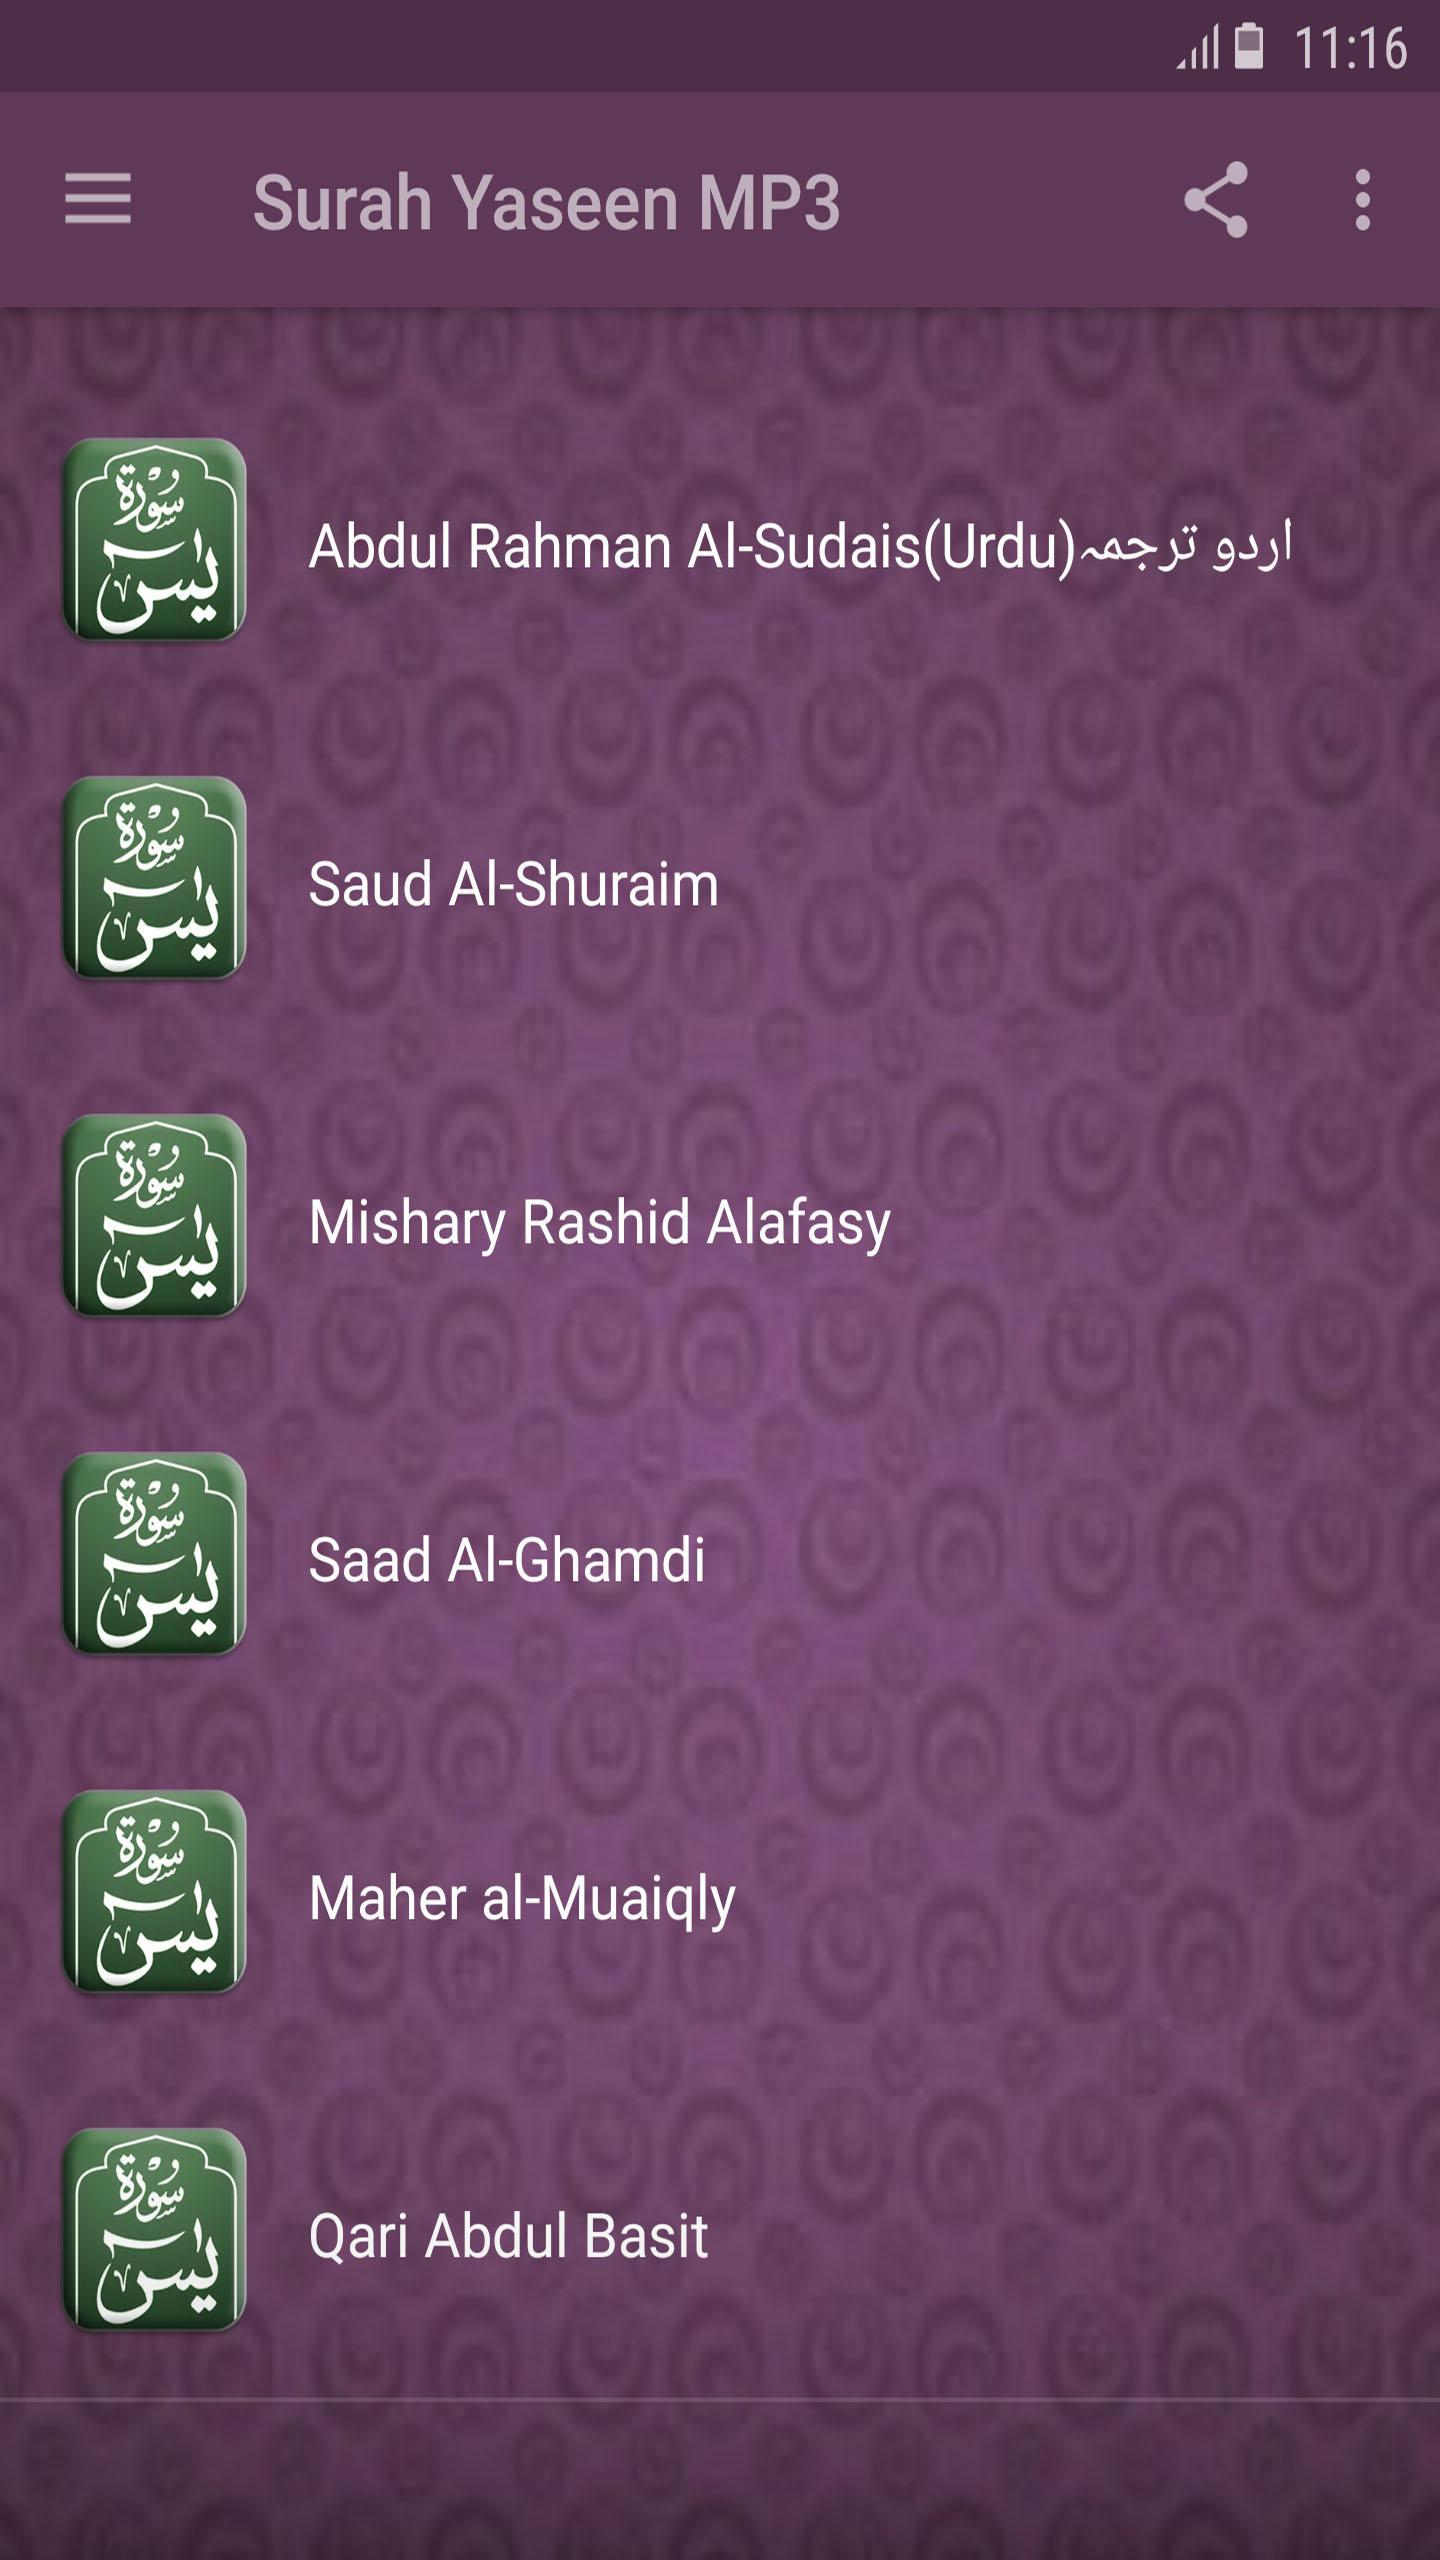 Surah Yasin Audio Mp3 - Urdu Translation (Yaseen) for